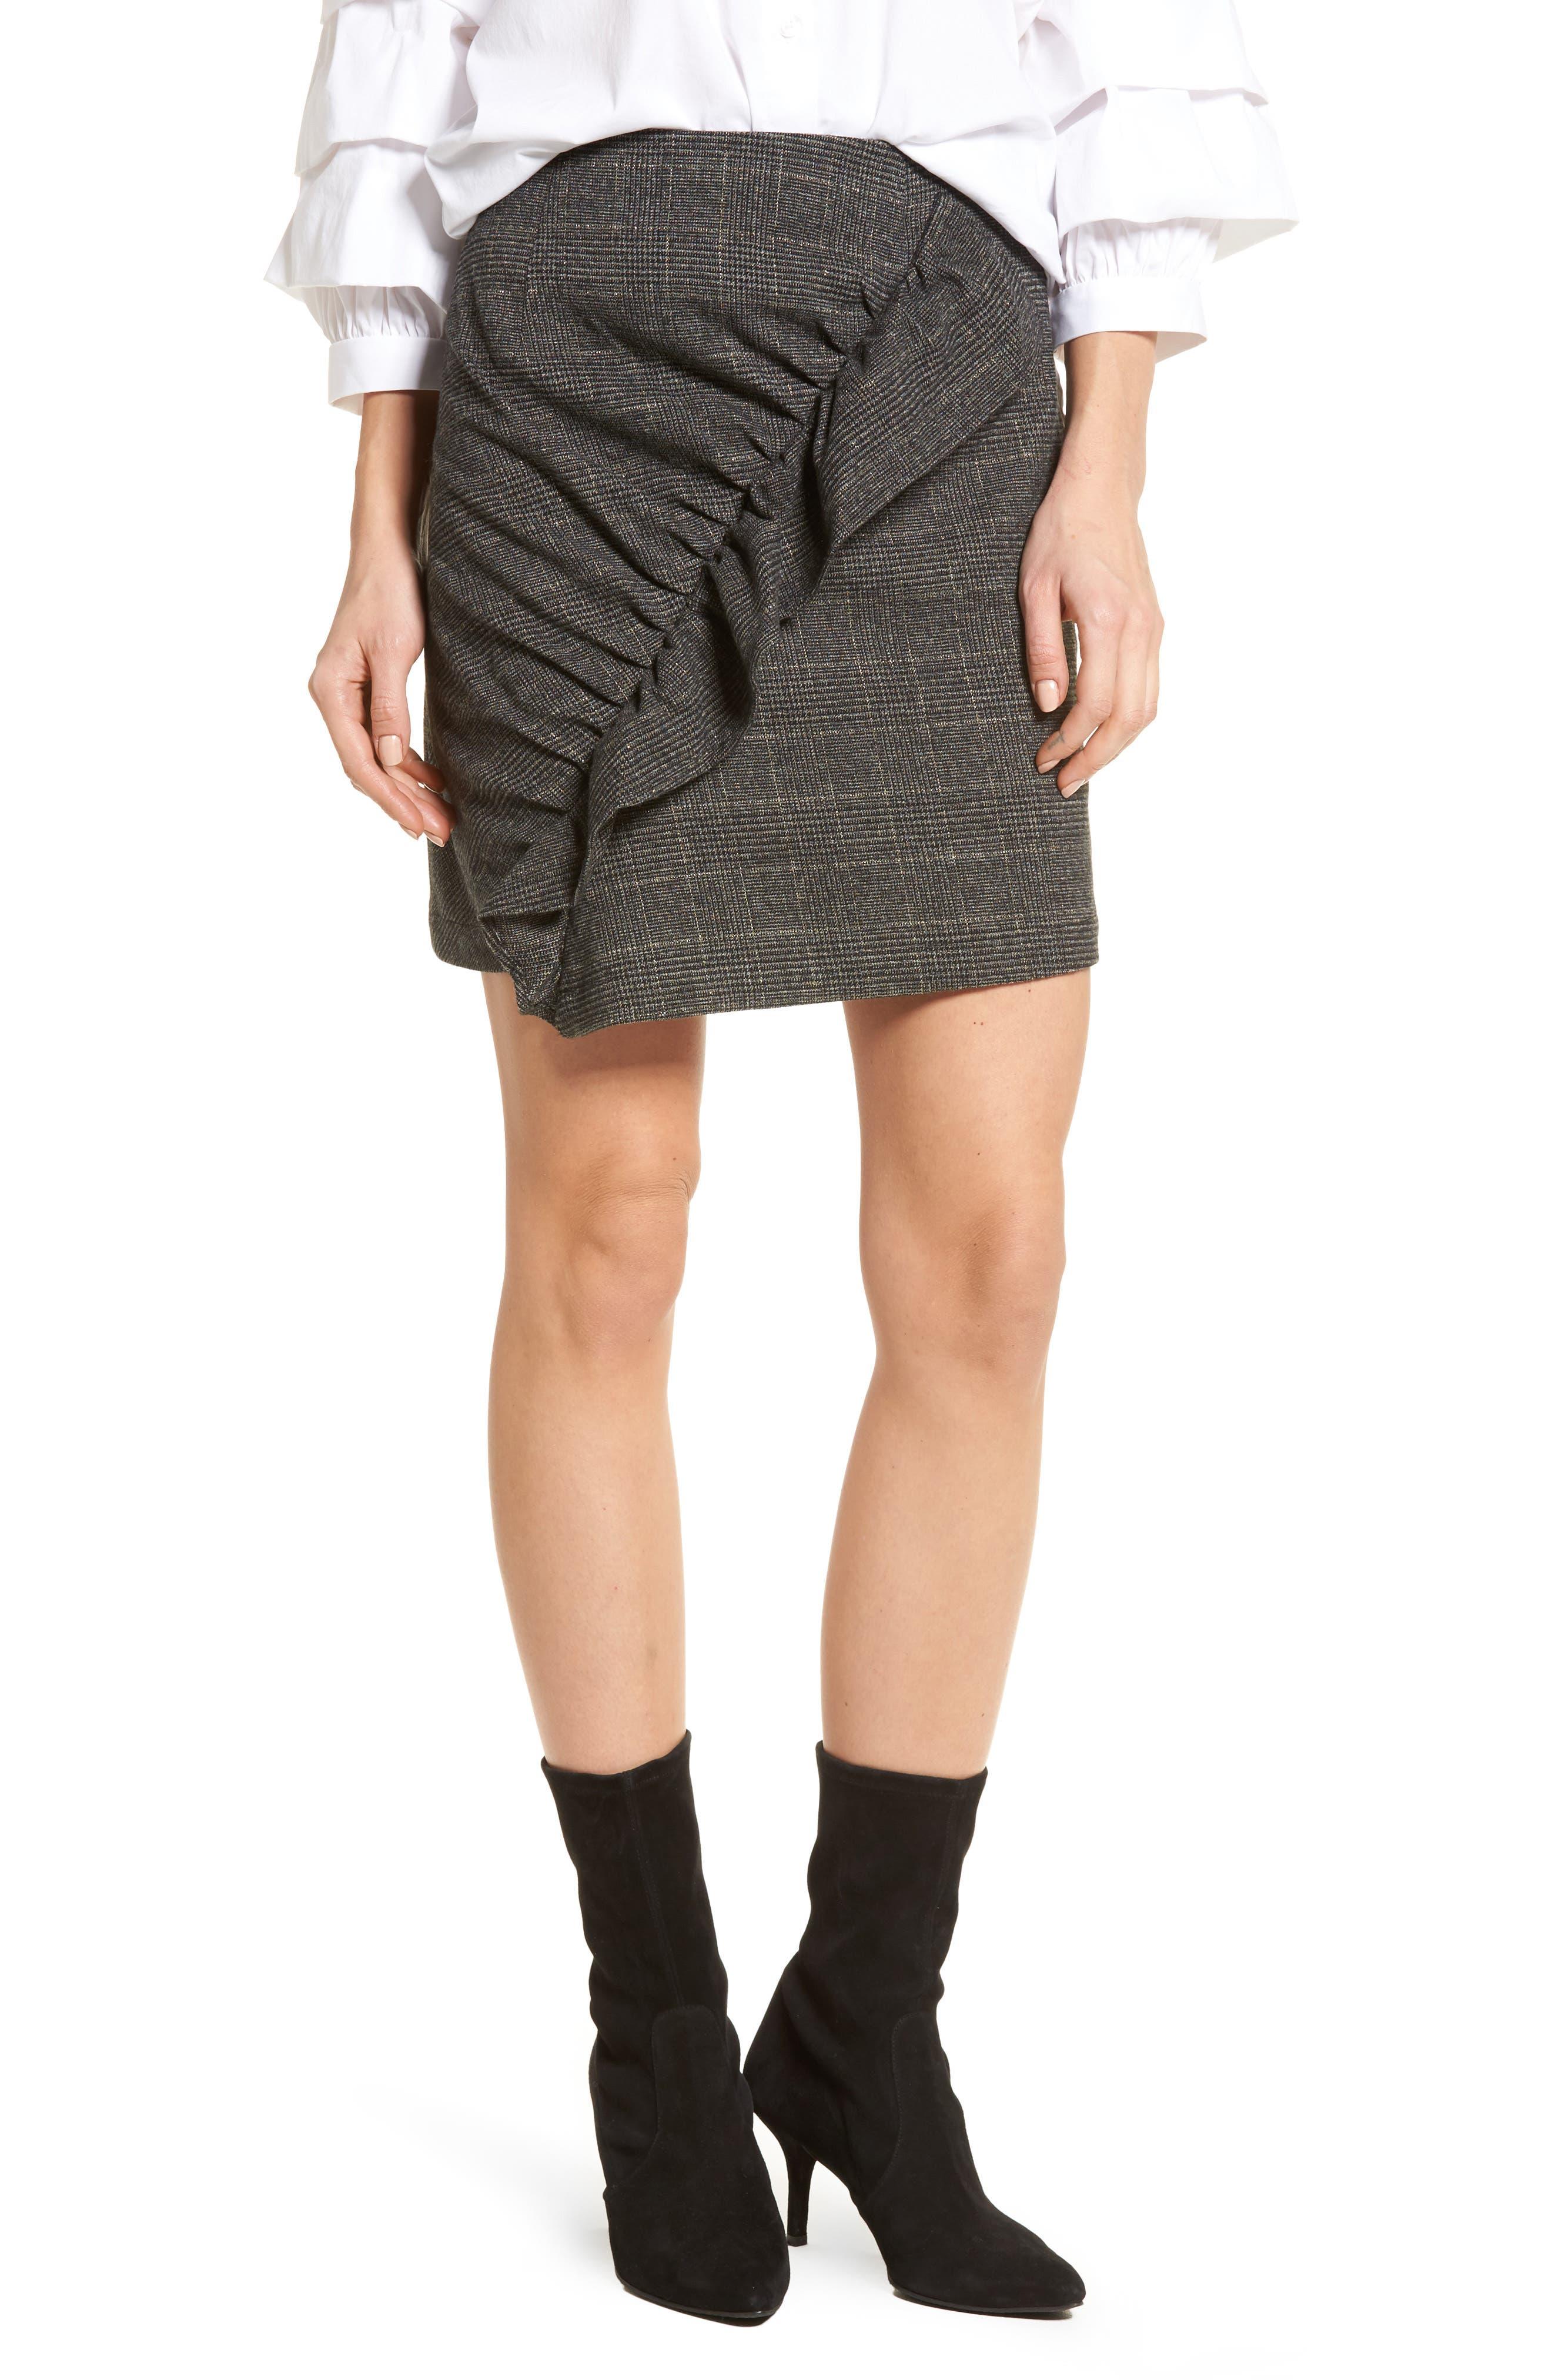 Alternate Image 1 Selected - BP. Glen Plaid Ruched Ruffle Skirt